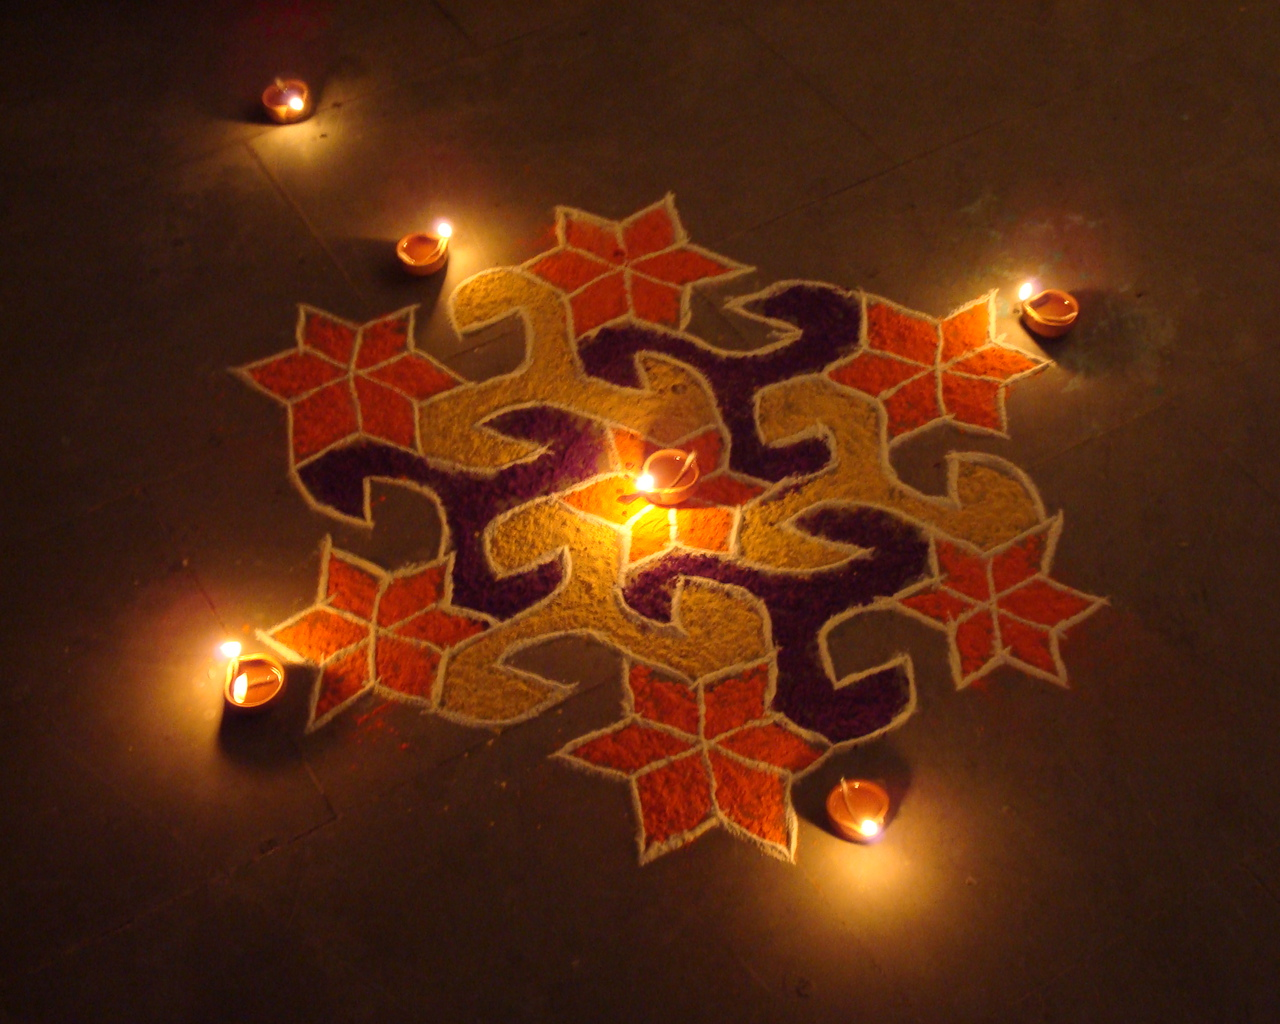 http://3.bp.blogspot.com/-DwP2aYV0GDY/UJ4ebdTCmFI/AAAAAAAAMxo/ivP2m4saV8w/s1600/Diwali-2012-Rangoli-Design-Ideas-Wallpapers-4.jpg